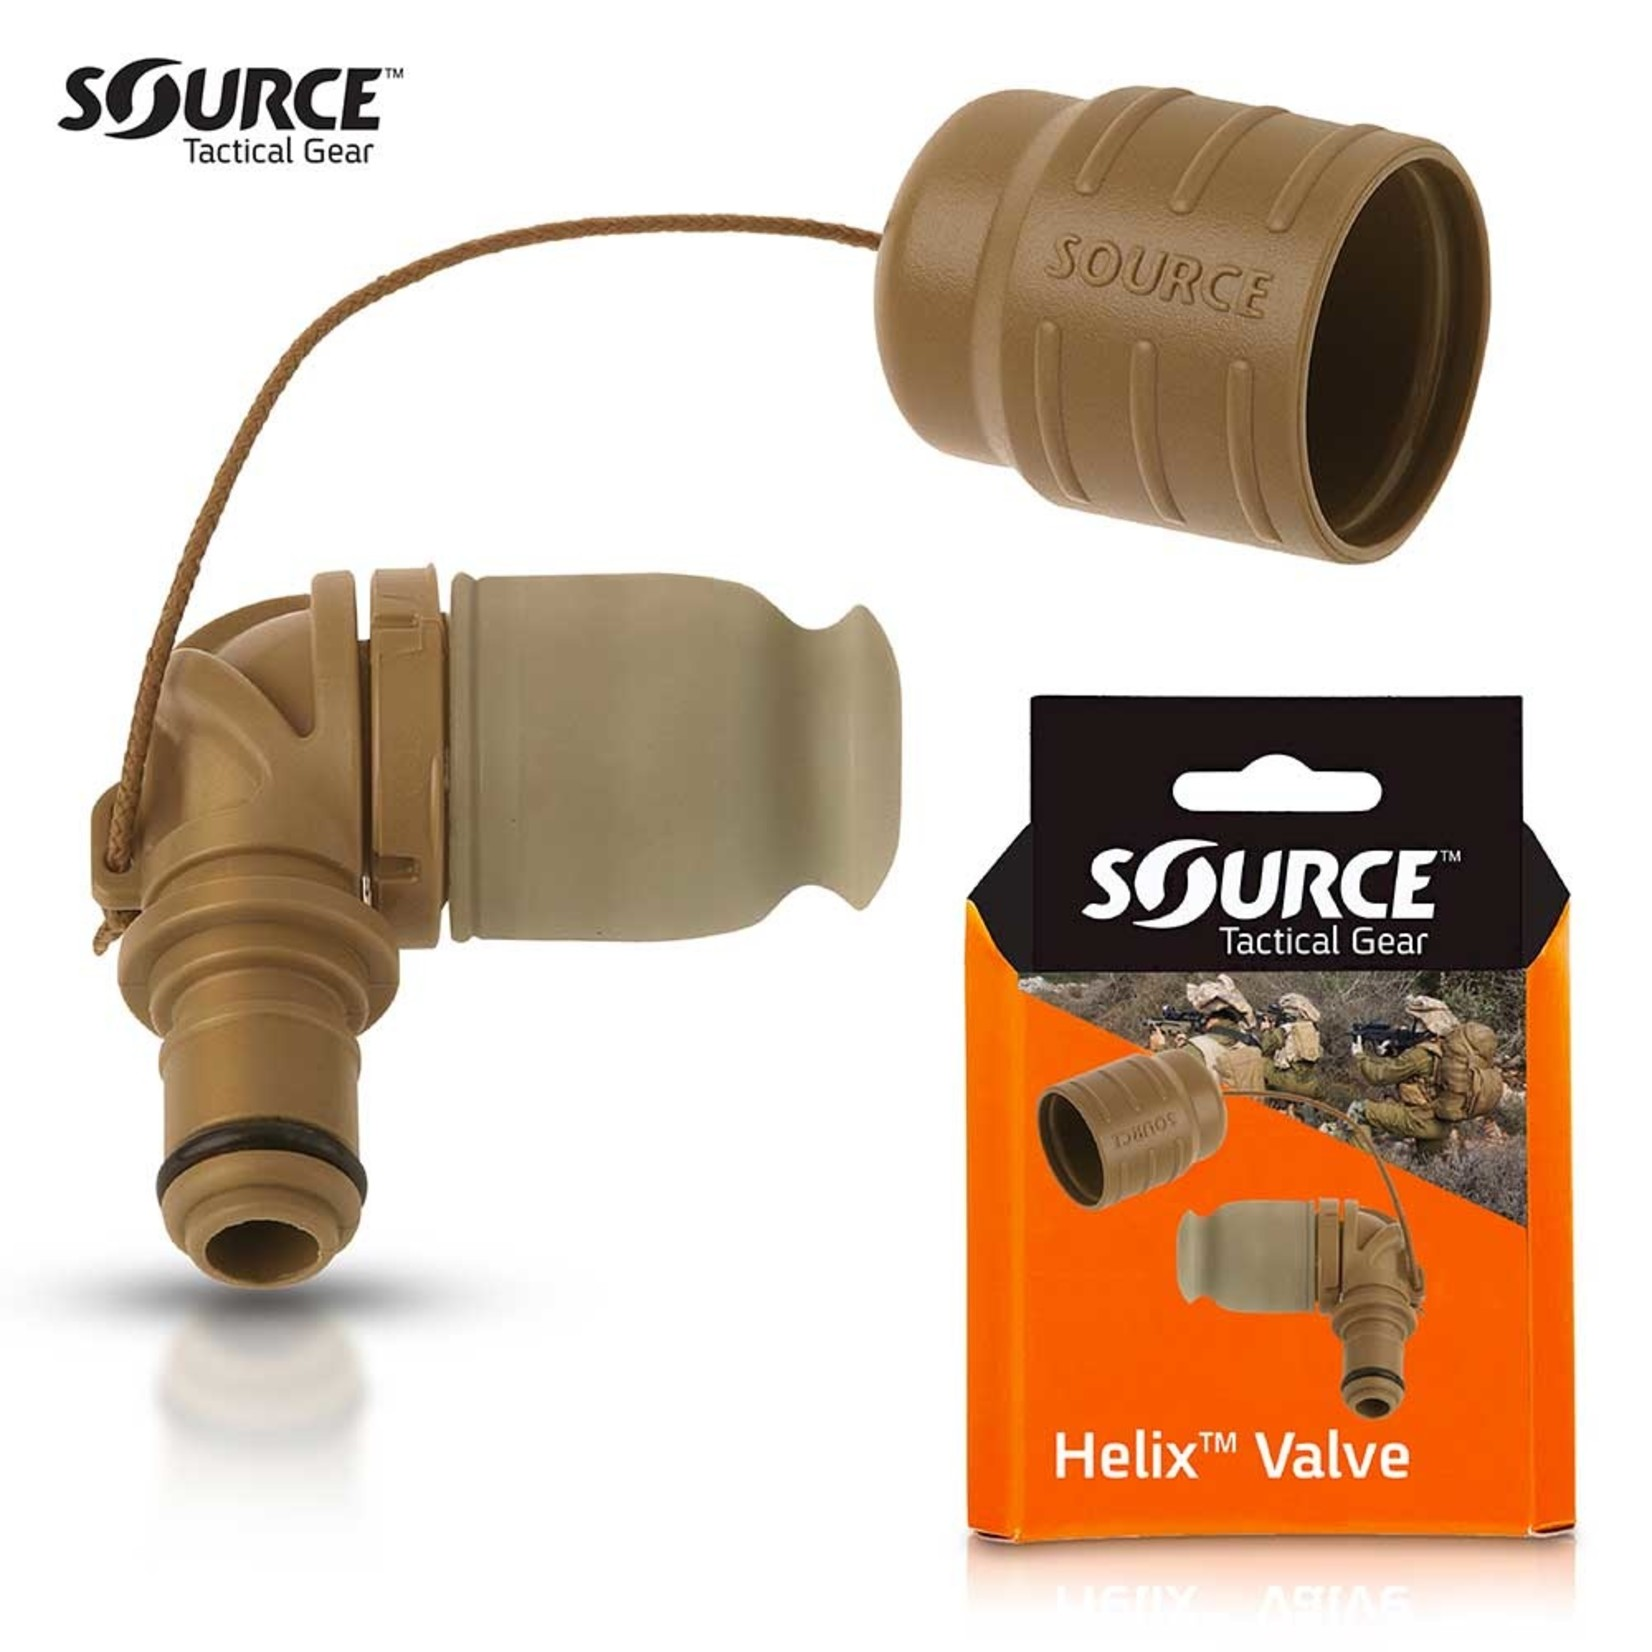 SOURCE TACTICAL GEAR HELIX | HIGH PERFORMANCE BITE VALVE